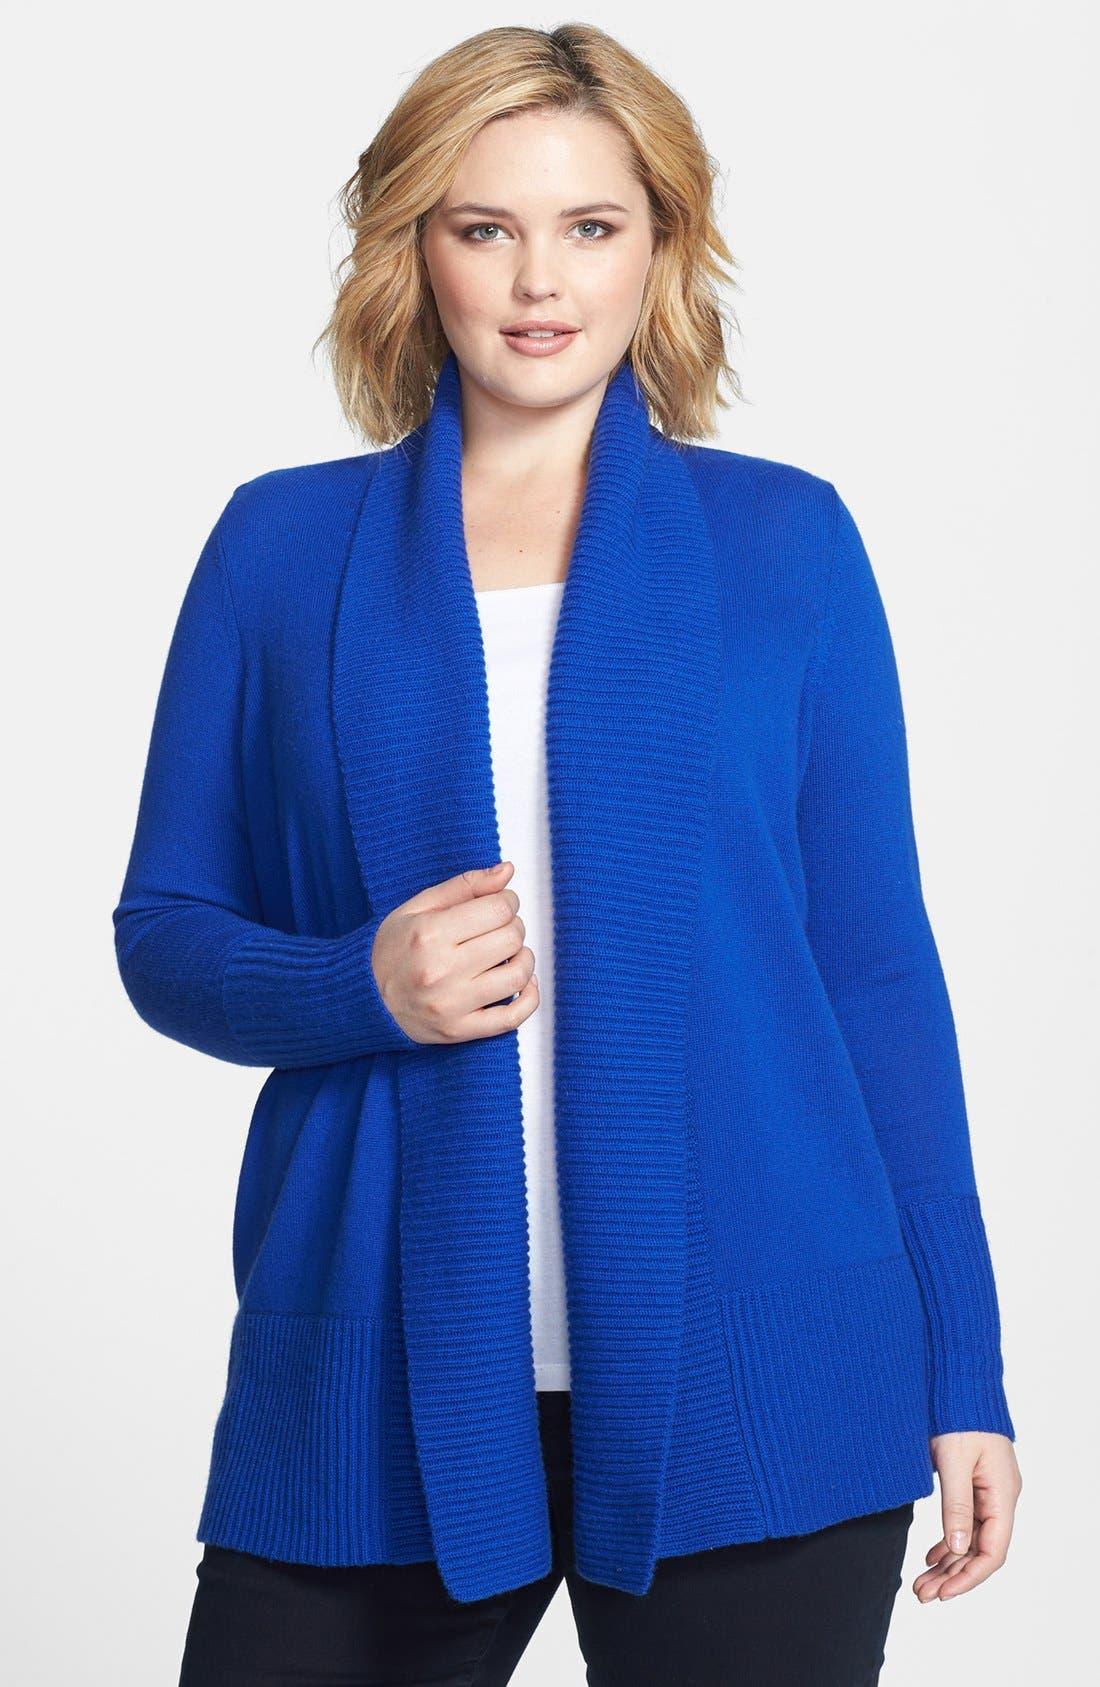 Alternate Image 1 Selected - Caslon® Shawl Collar Wool & Cashmere Cardigan (Plus Size)